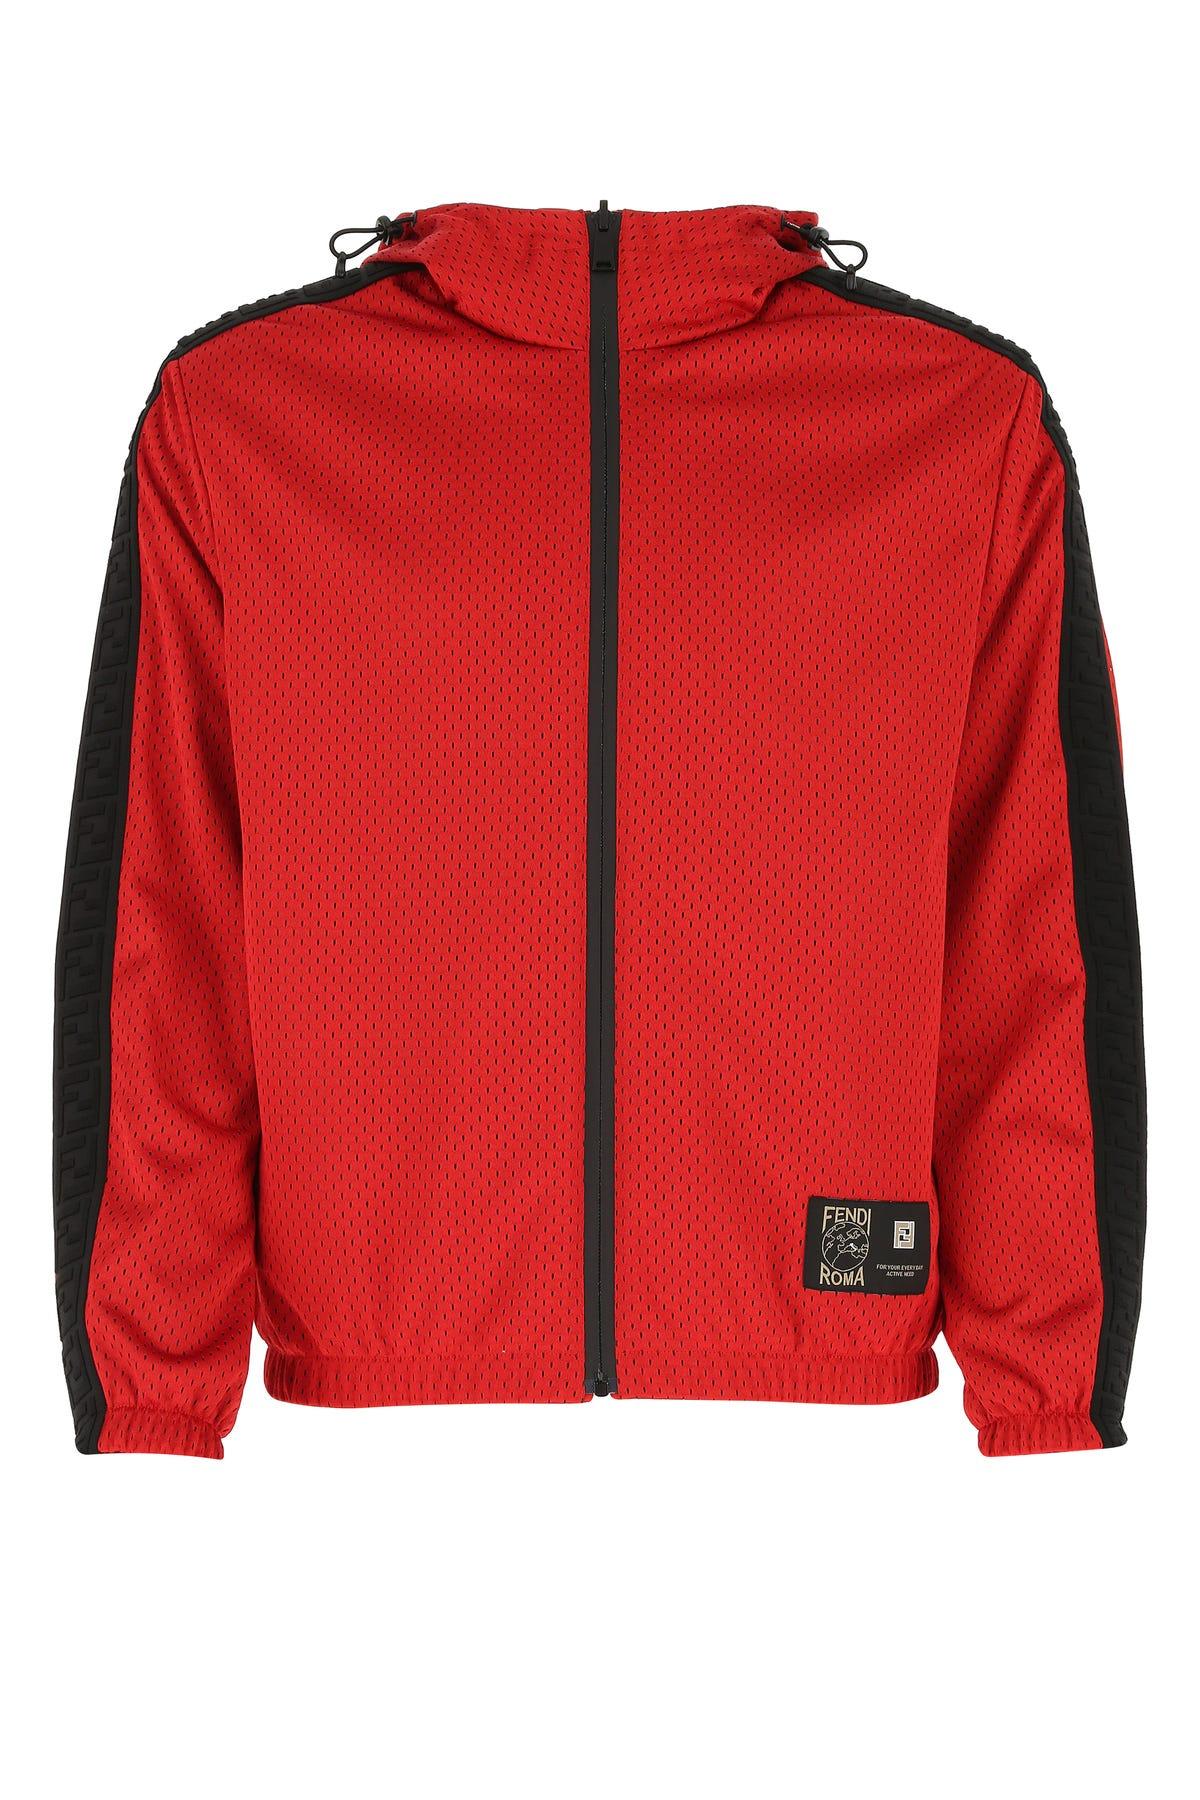 Fendi Clothing RED POLYESTER REVERSIBLE JACKET  RED FENDI UOMO 50